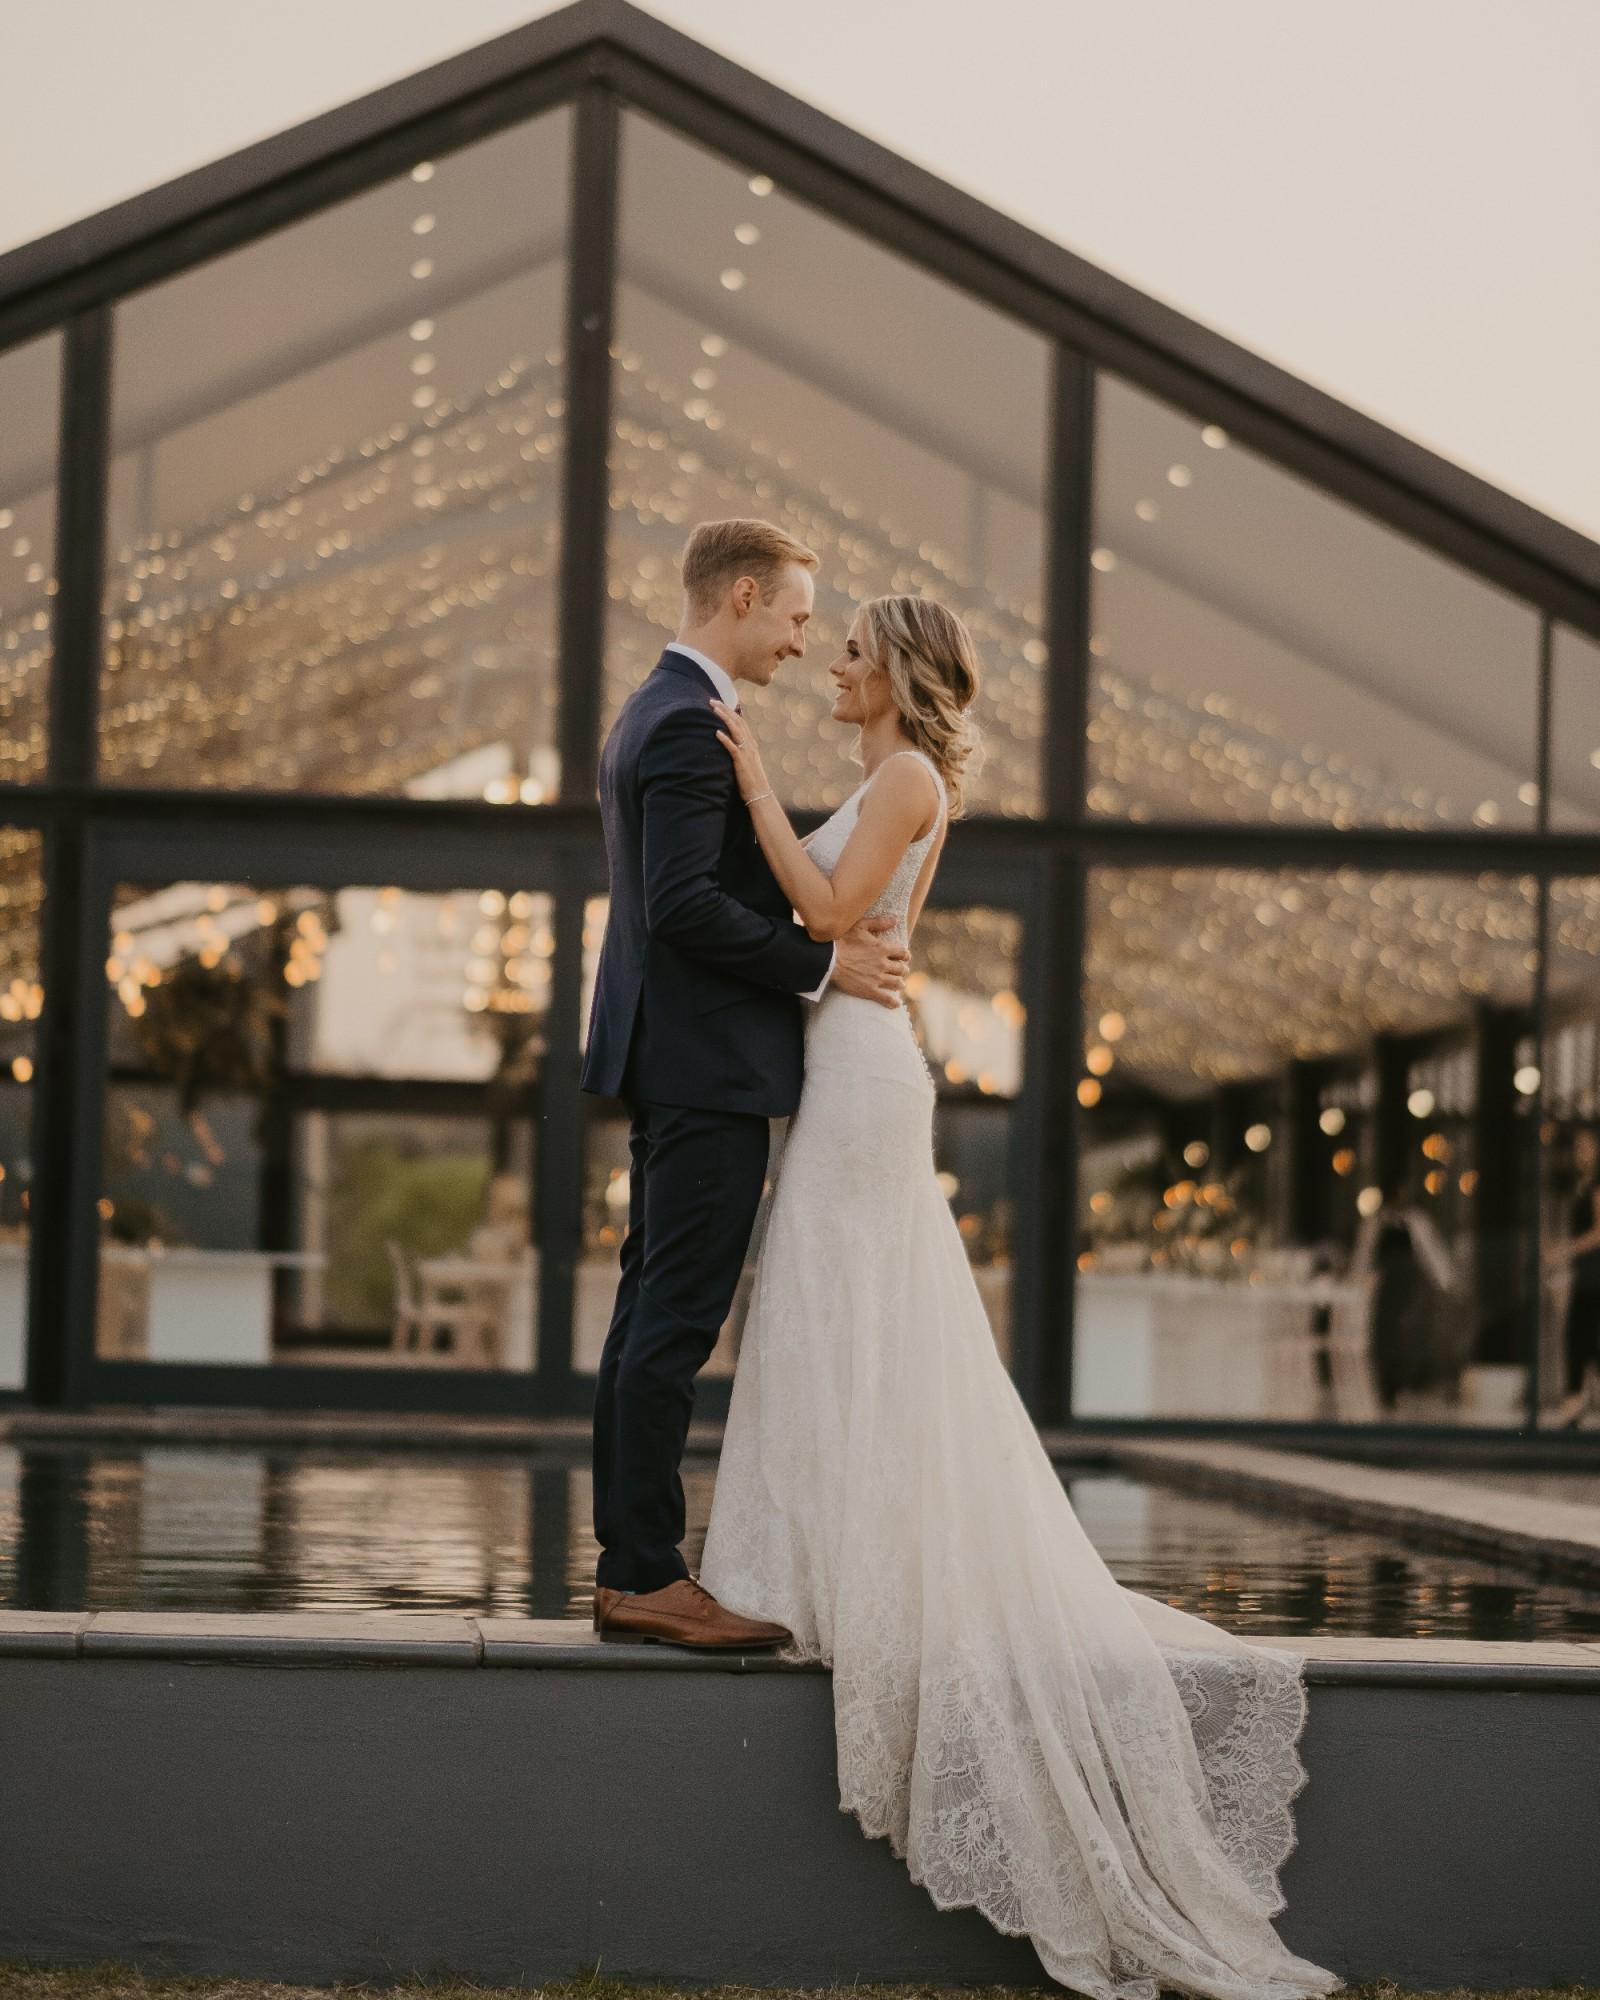 Rosa Clara Dayne Preloved Wedding Dress Save 41% - Stillwhite